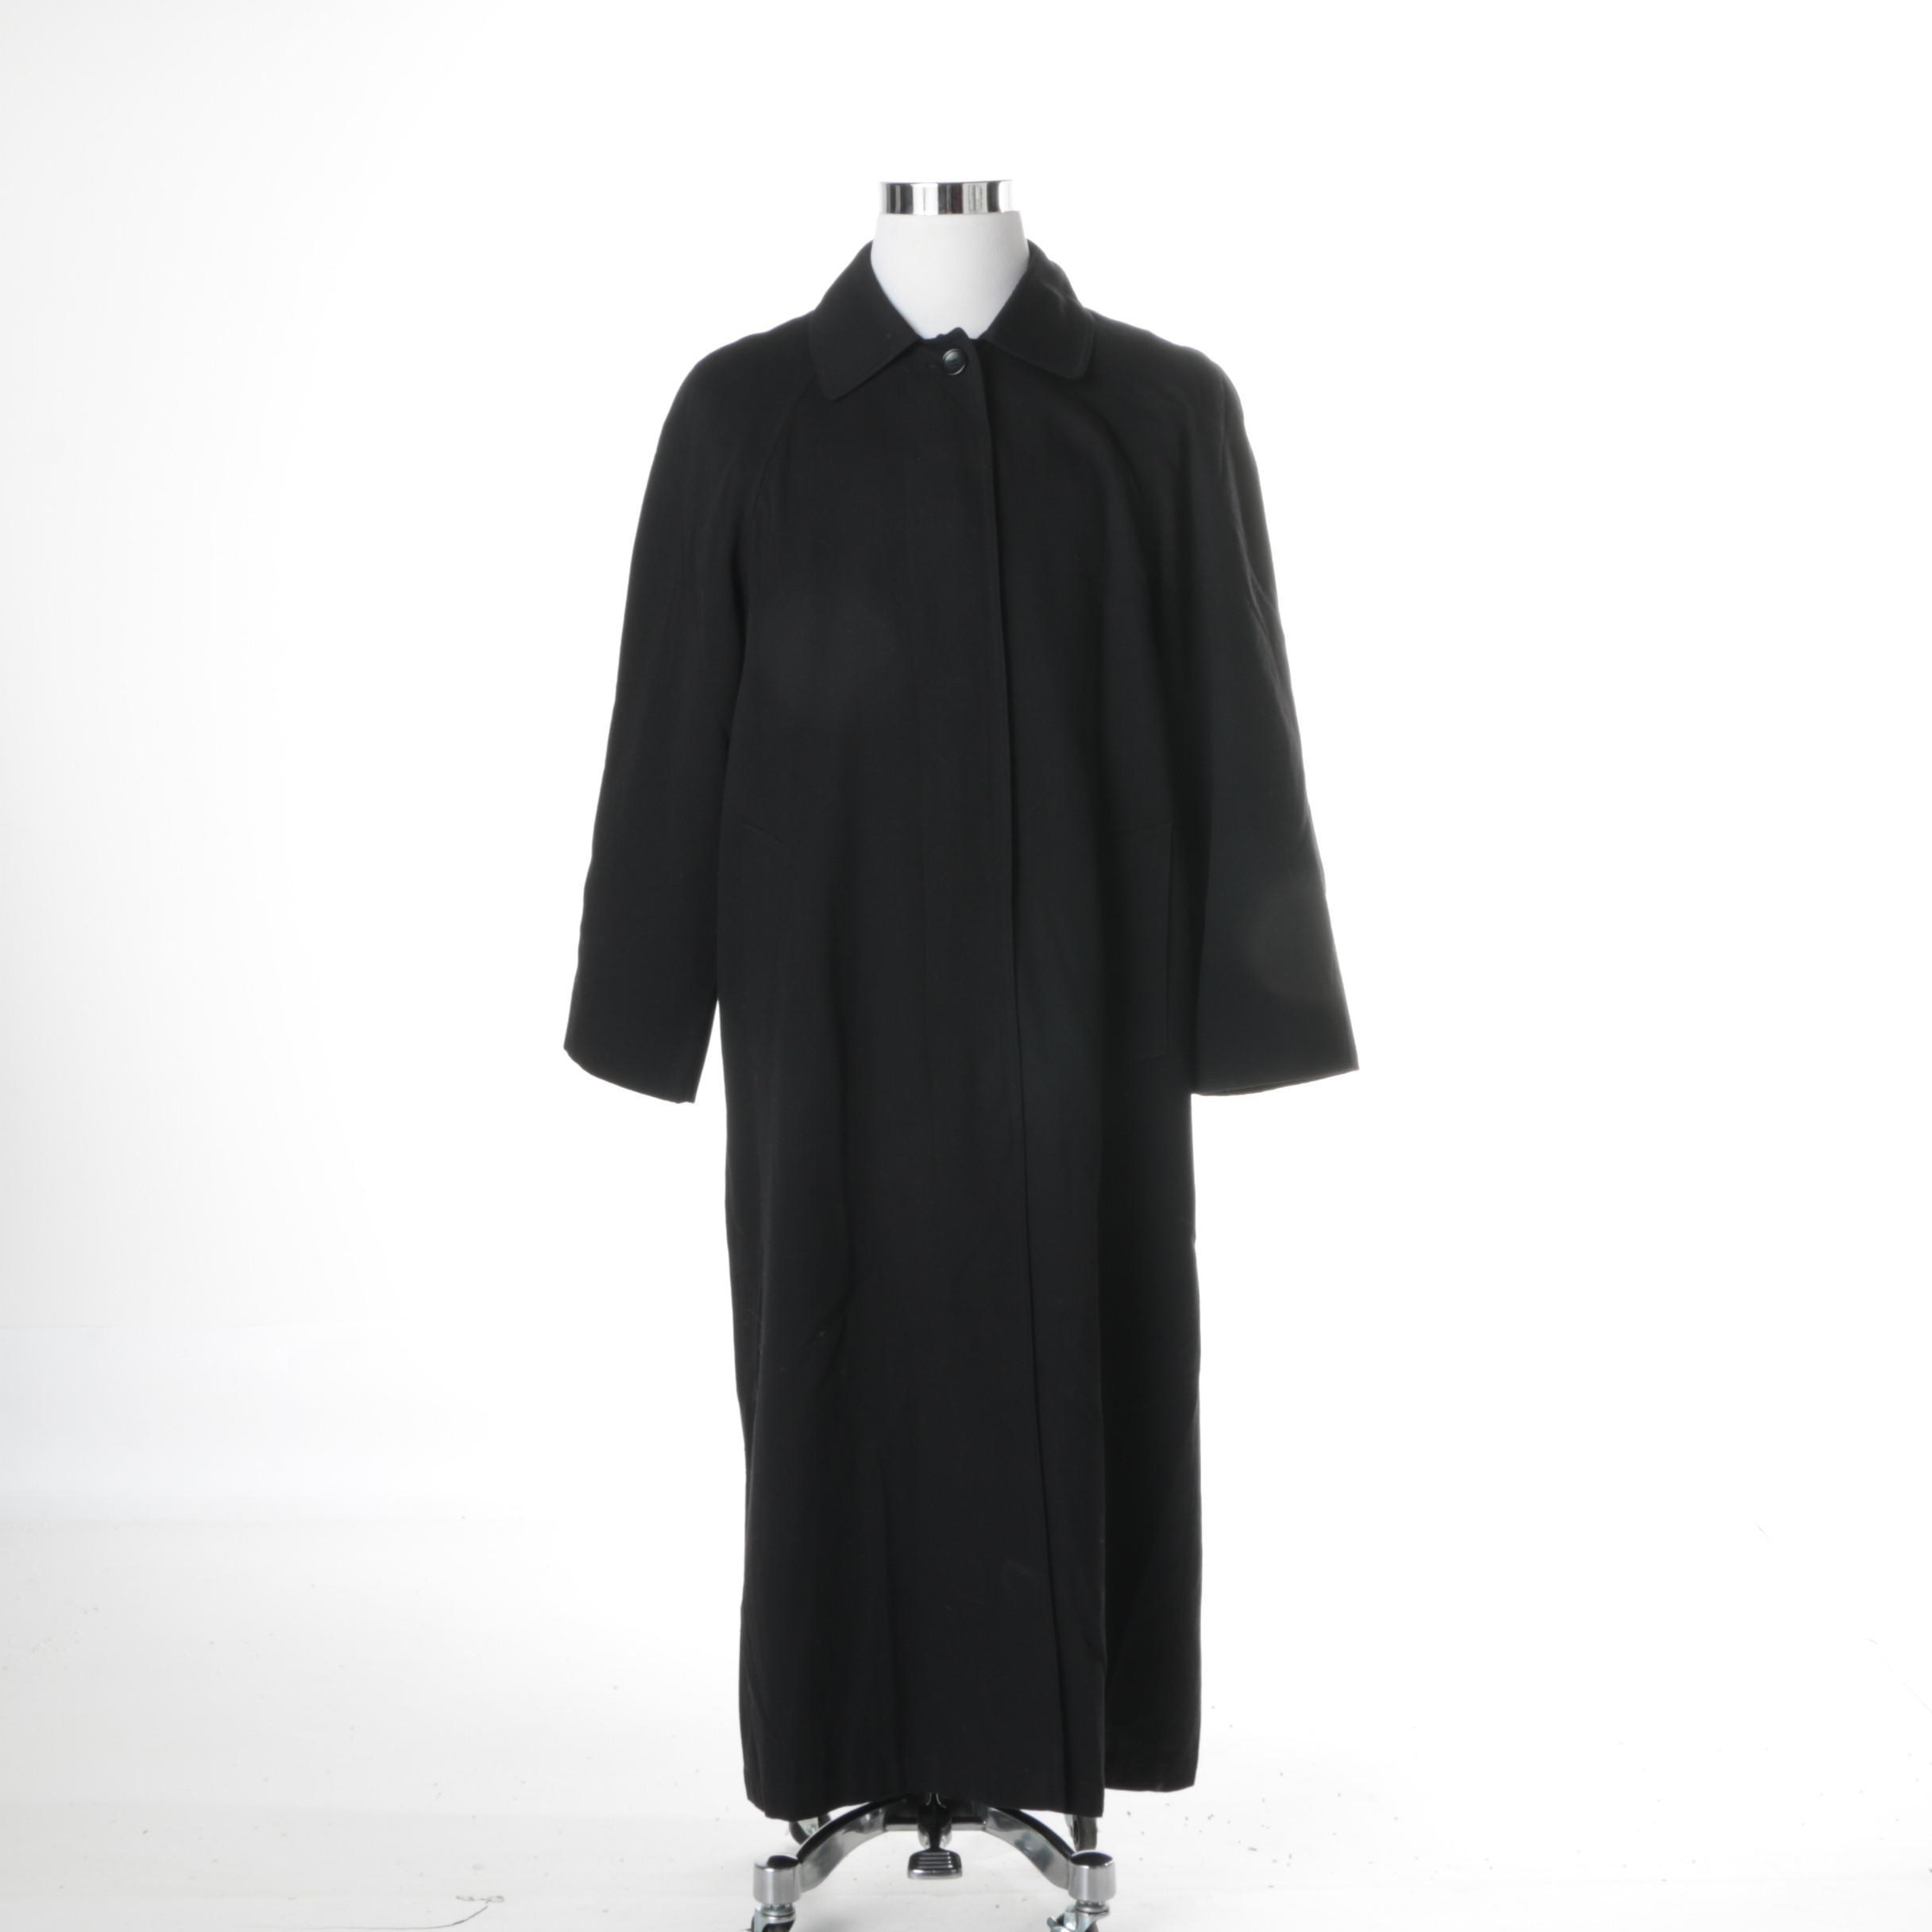 London Fog Black Trench Style Coat